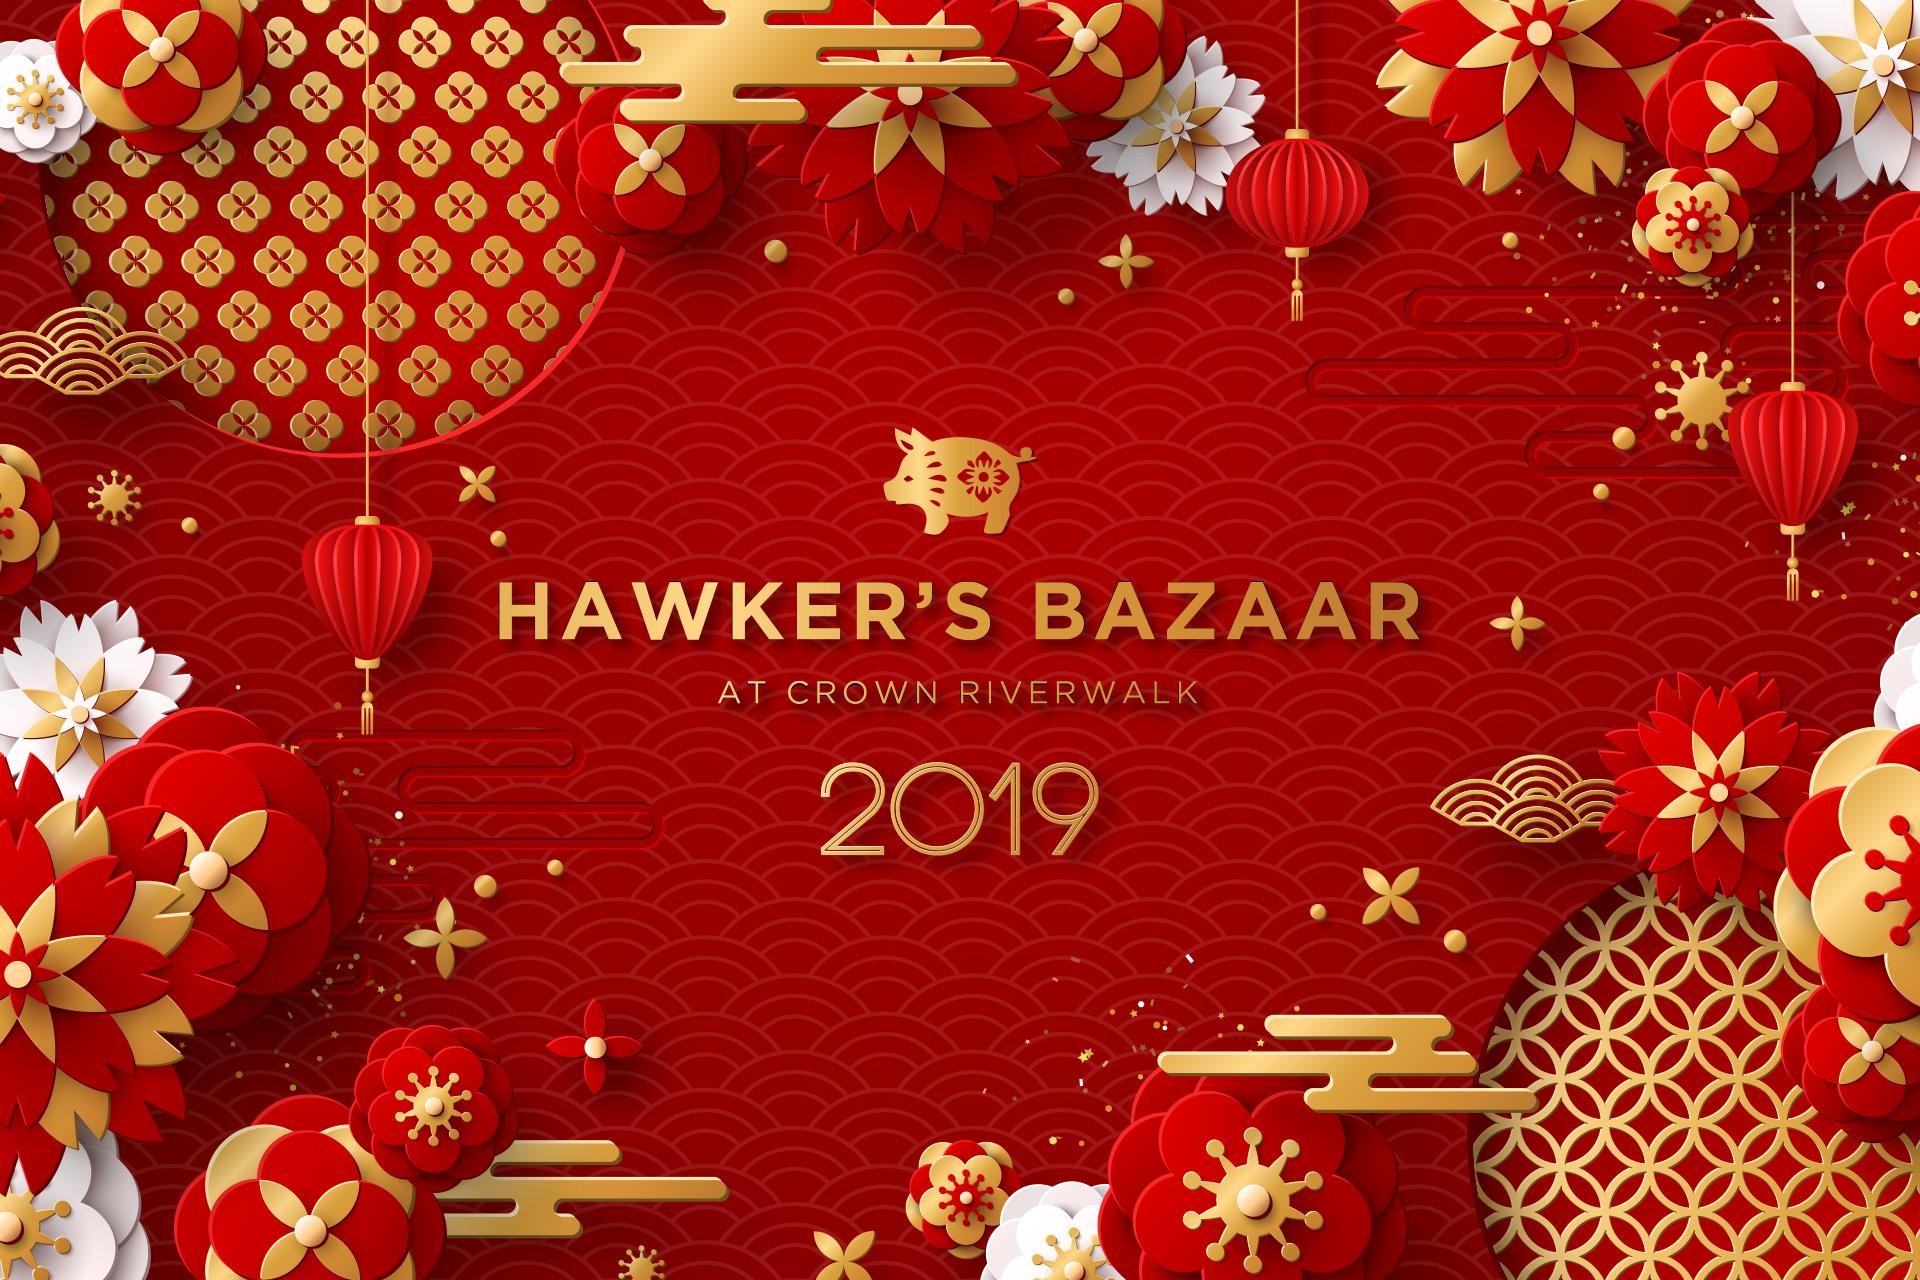 Lunar New Year 2019 at Crown